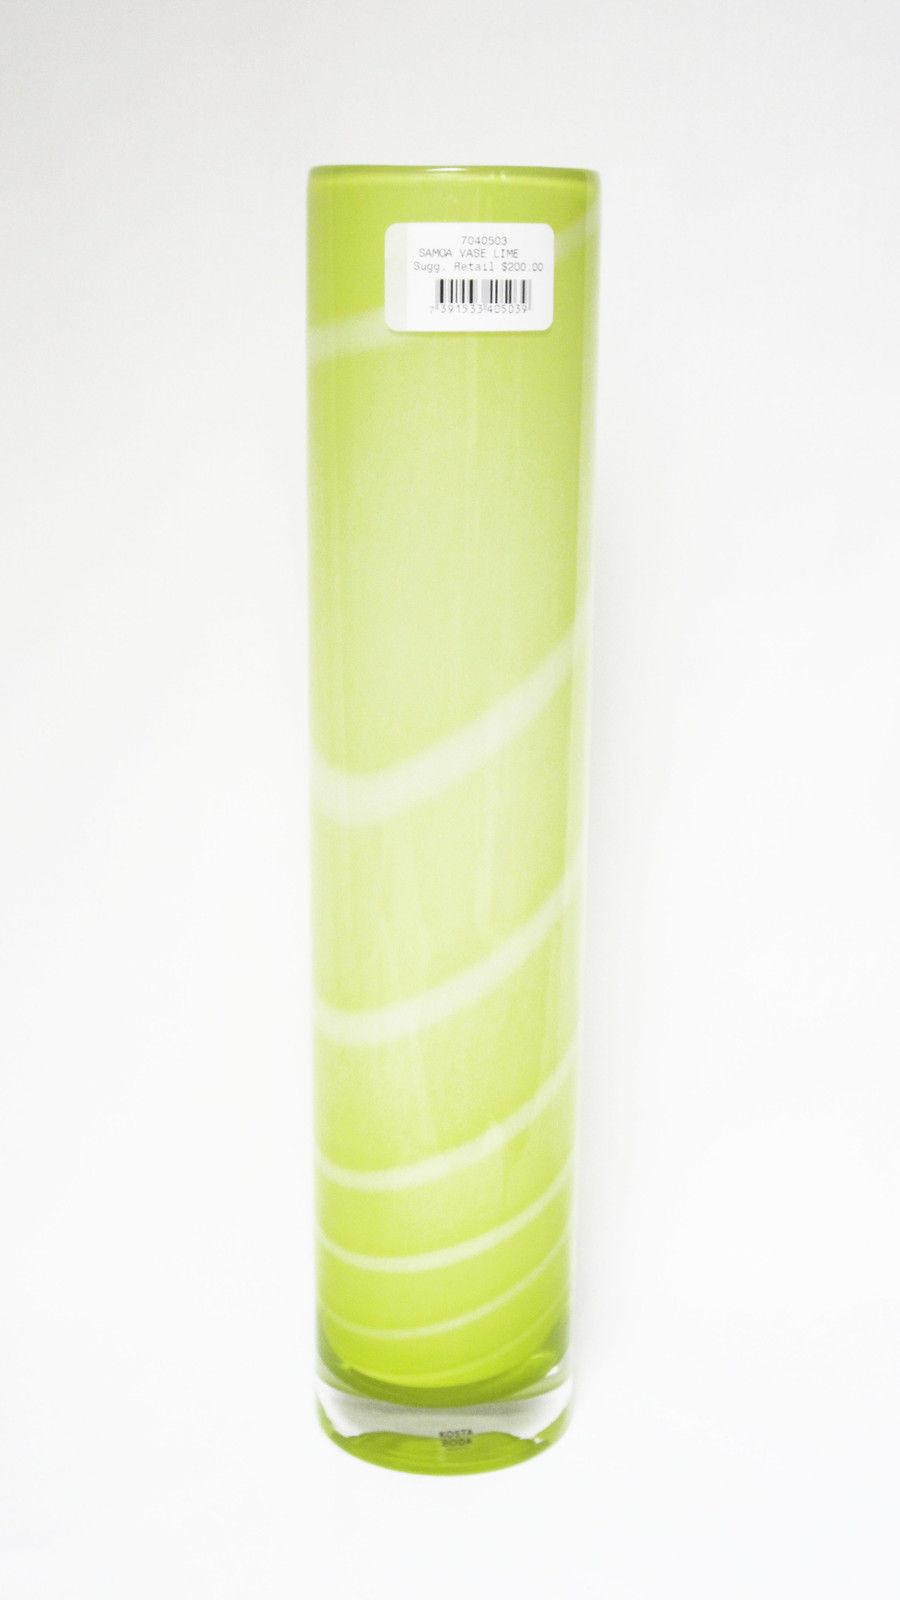 kosta boda crystal vase of kosta boda swedish crystal anna ehrner samoa vase lime ebay regarding s l1600